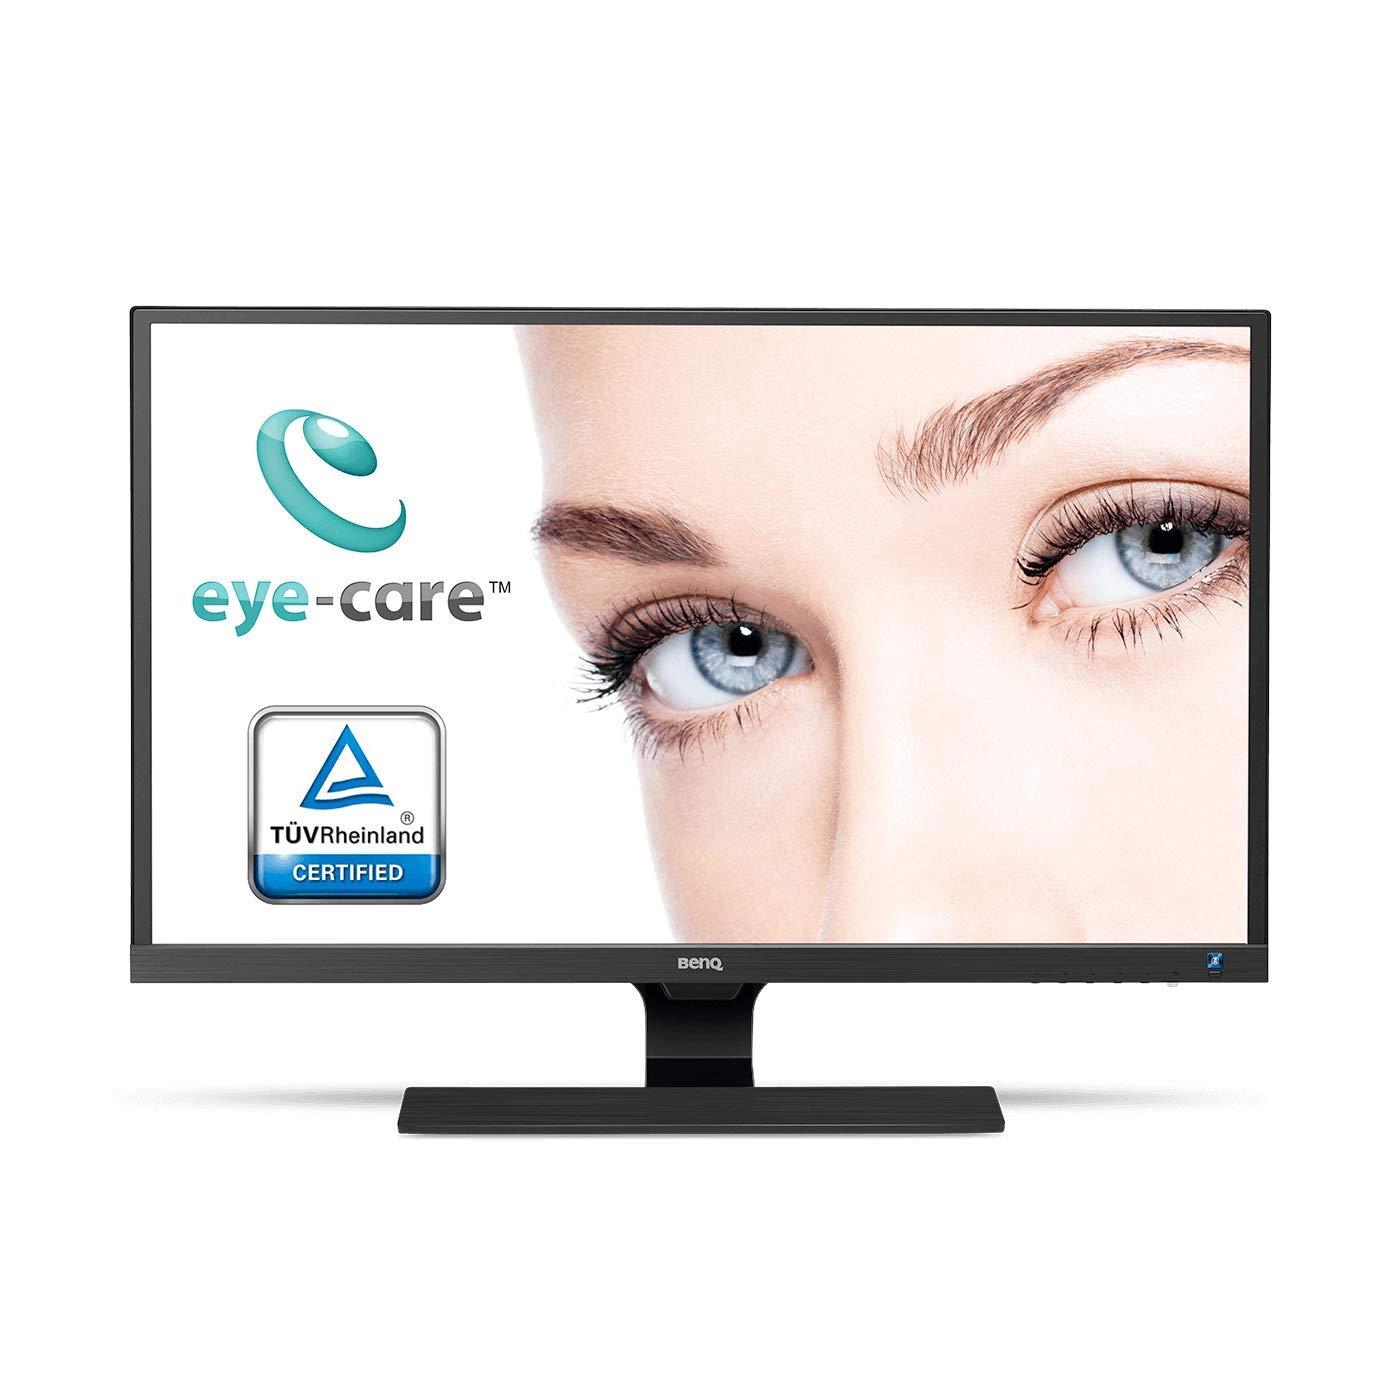 BenQ EW277HDR - Monitor de 27' FHD, HDR (Eye-Care, 1920 x 1080, Panel VA, 93% DCI-P3, 100% Rec. 709, Brightness Intelligence Plus, HDMI 2.0 x 2, VGA, Altavoces incorporados) BenQ EW277HDR - Monitor de 27 FHD